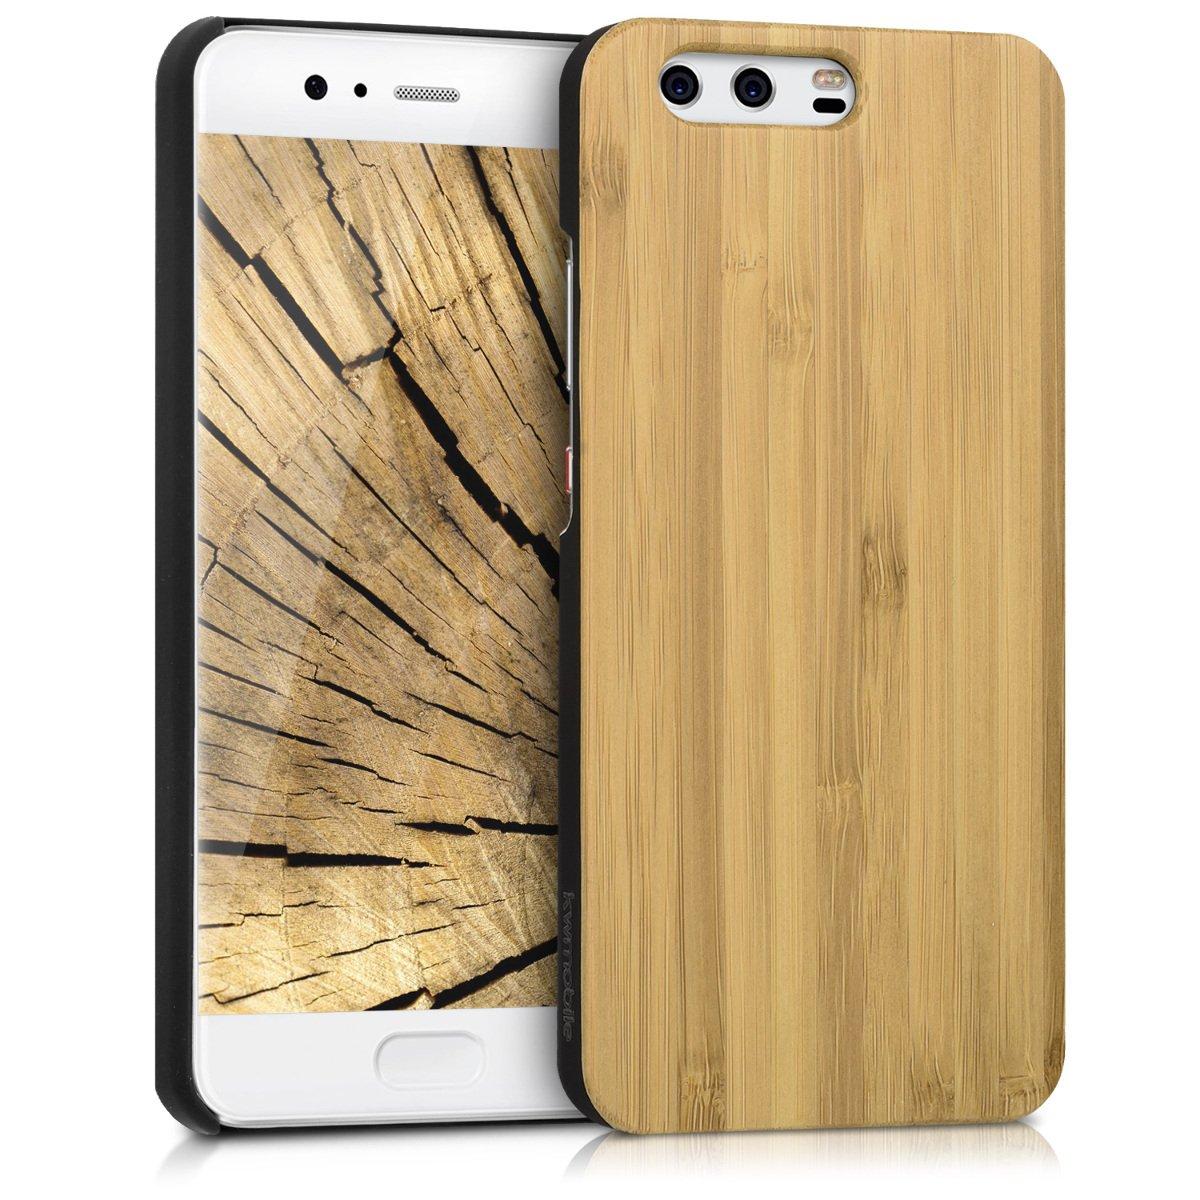 Amazon.com: Kwmobile Huawei P10 - Carcasa de madera para ...